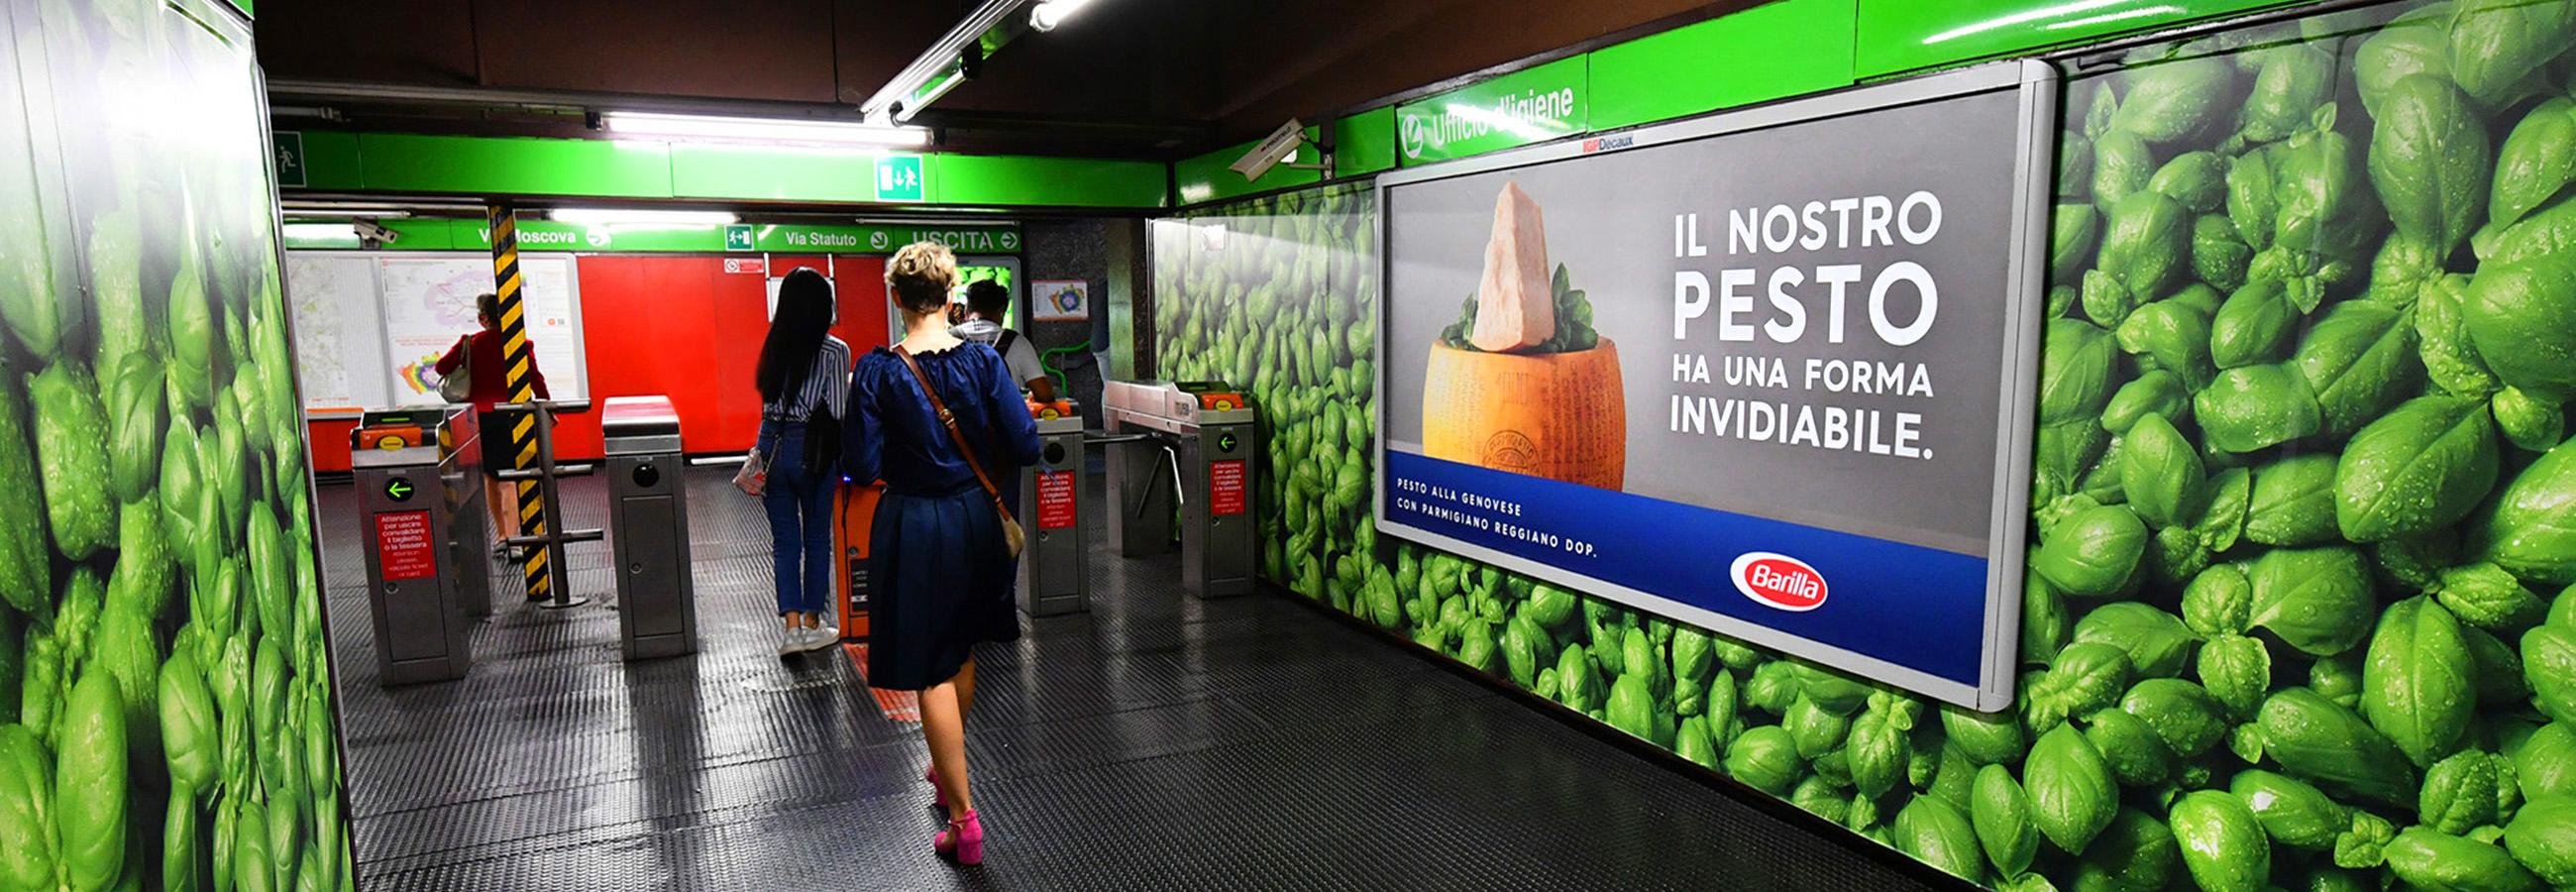 Banner Barilla Station Domination IGPDecaux Milano